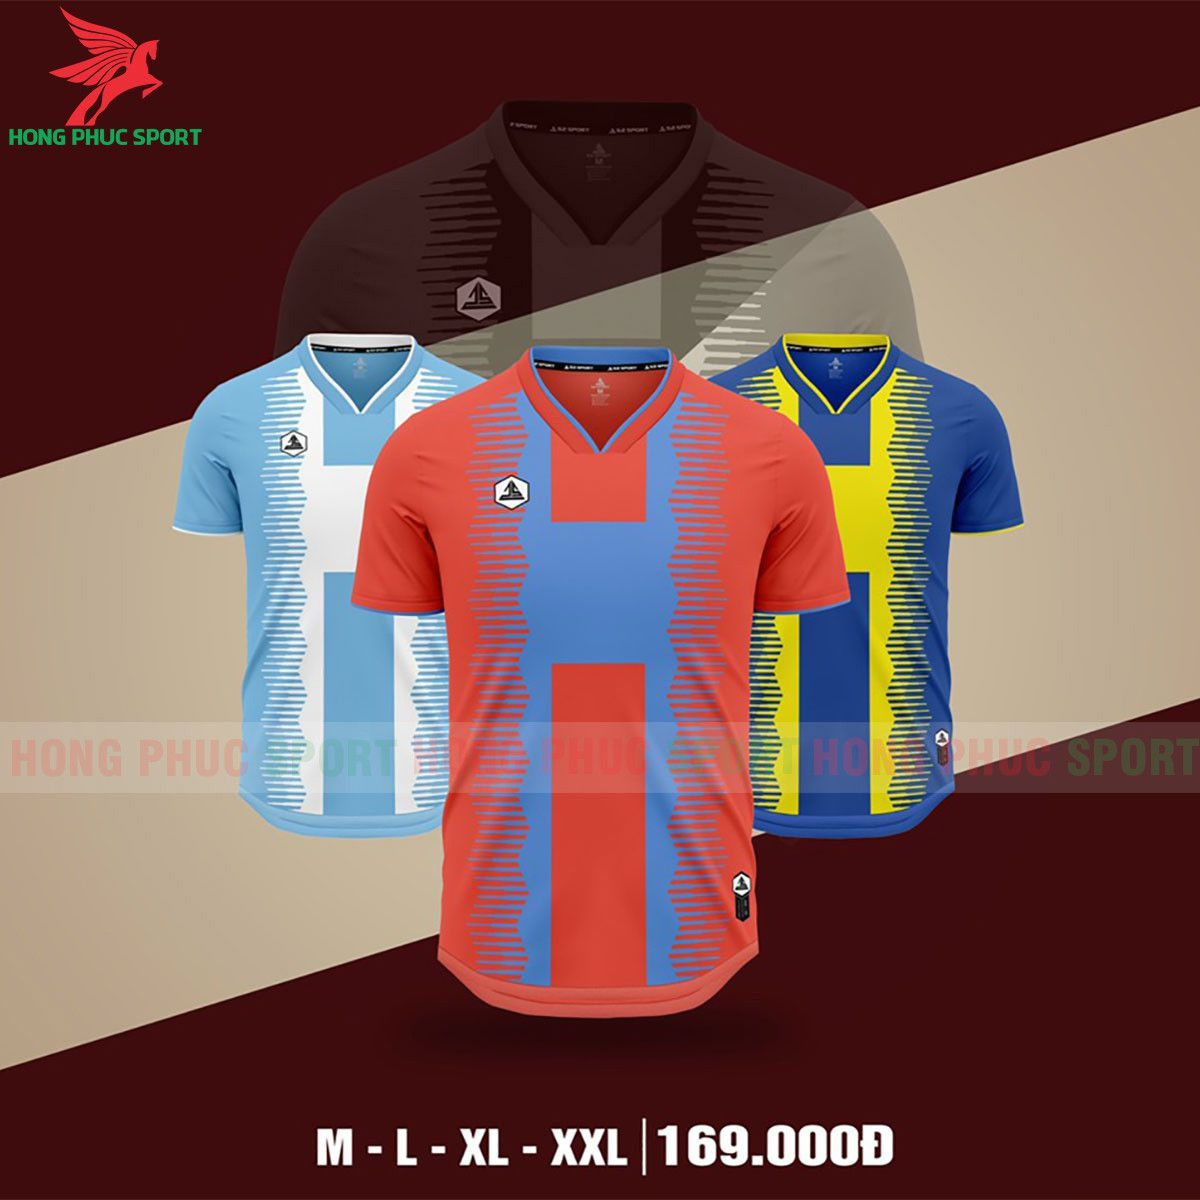 https://cdn.hongphucsport.com/unsafe/s4.shopbay.vn/files/285/ao-bong-da-khong-logo-authentic-2021-comienzo-hong-1-60f5419b73a05.jpg